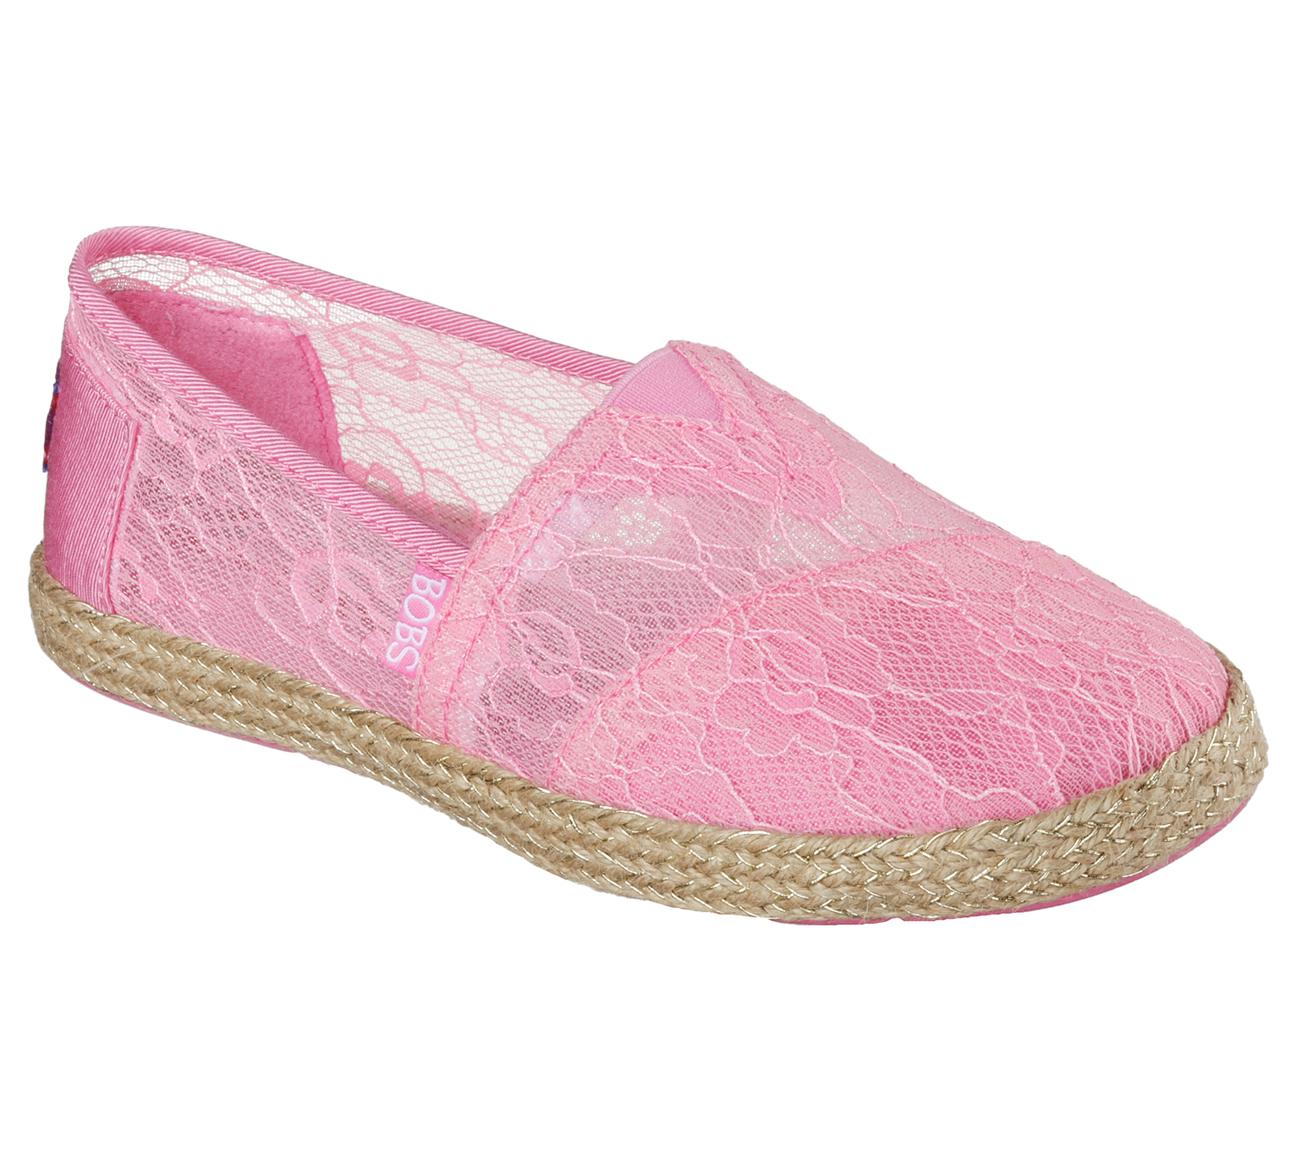 buy skechers bobs flexpadrille sheer luck bobs shoes